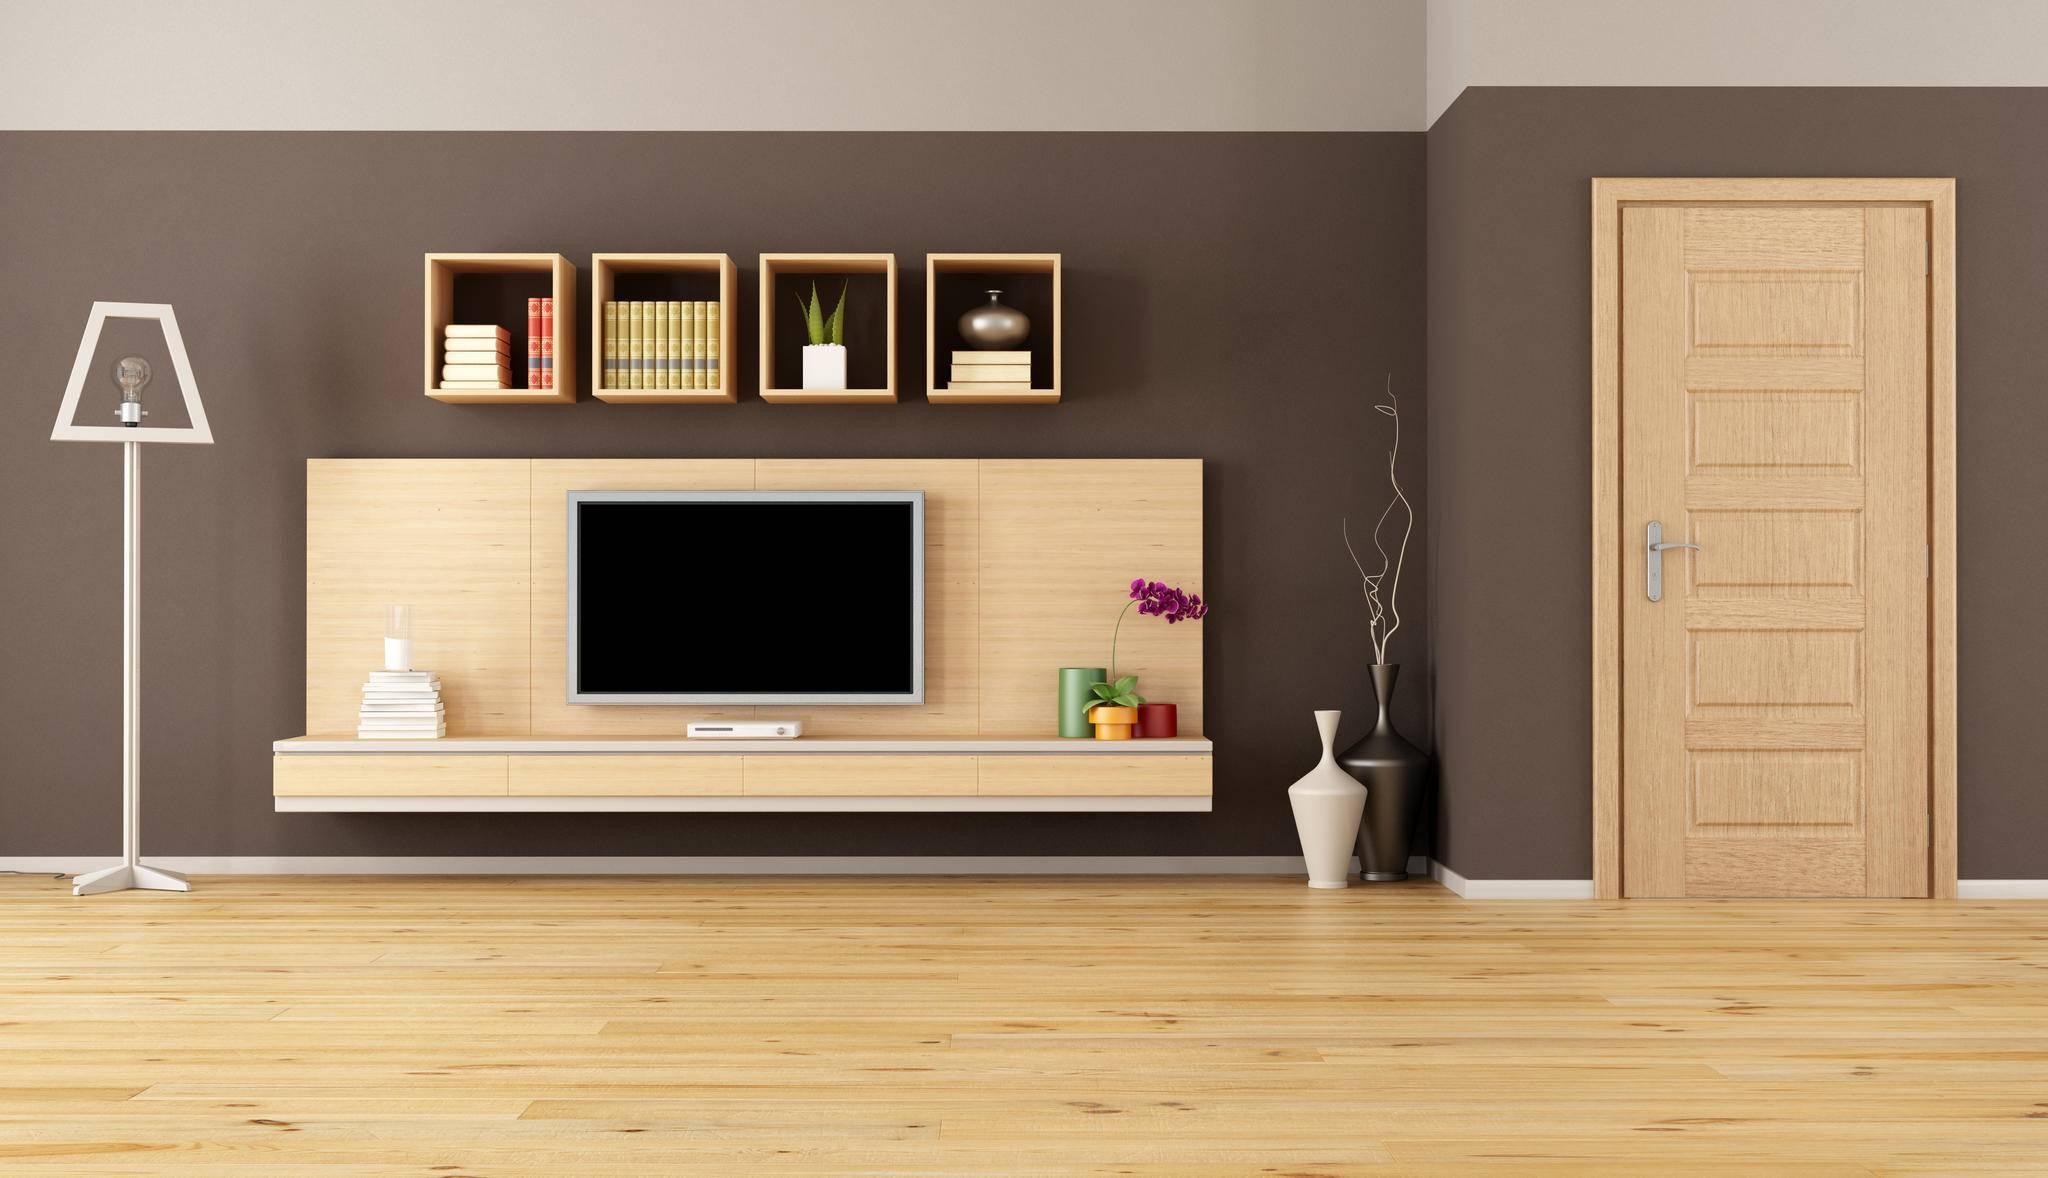 Perfekt Integriert: So Lässt Sich Der Fernseher Verstecken